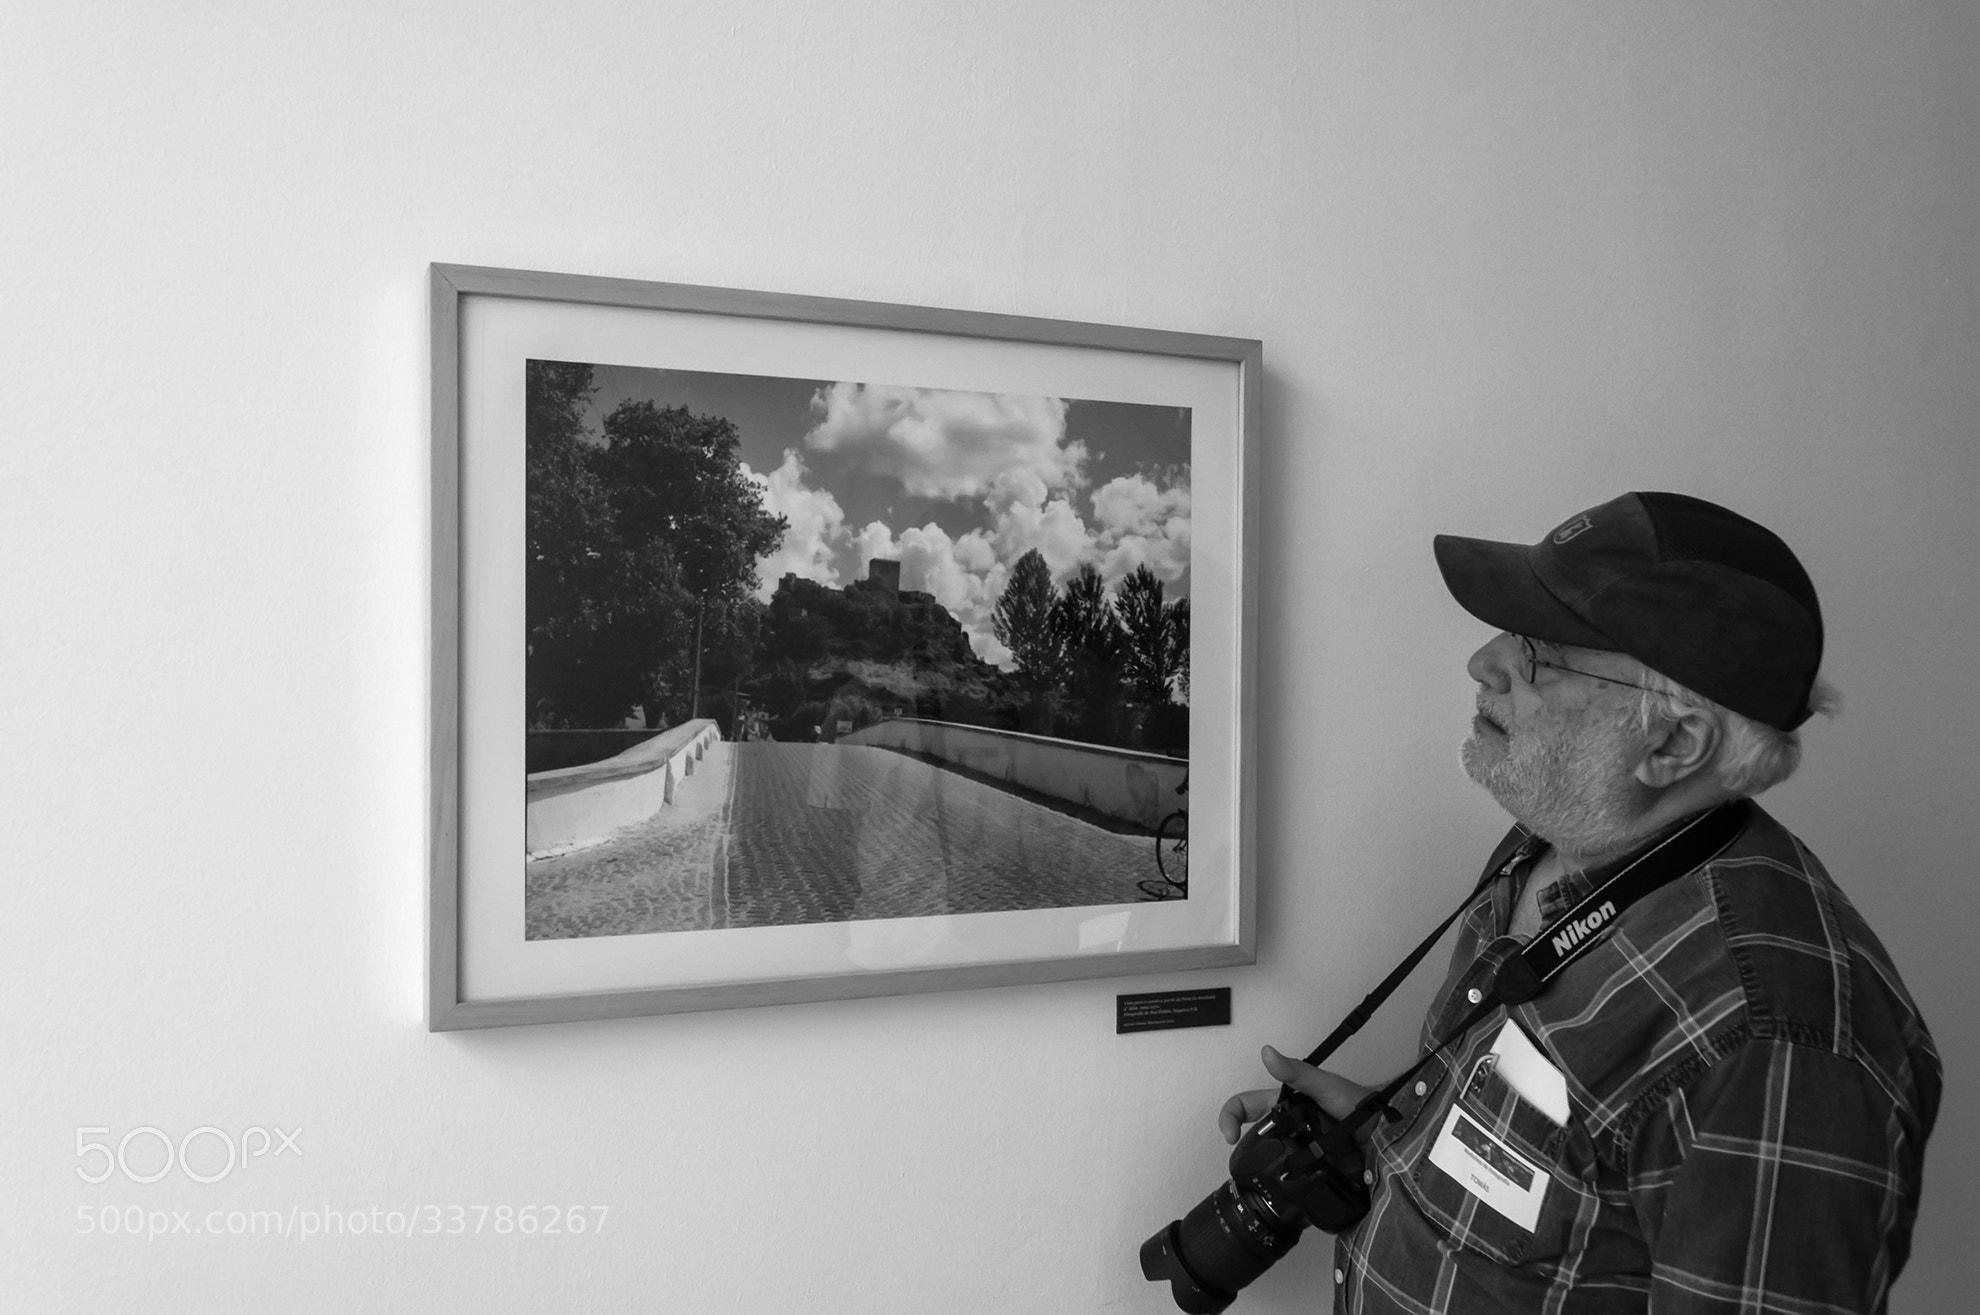 Photograph Contemplative photographer by Jorge Orfão on 500px